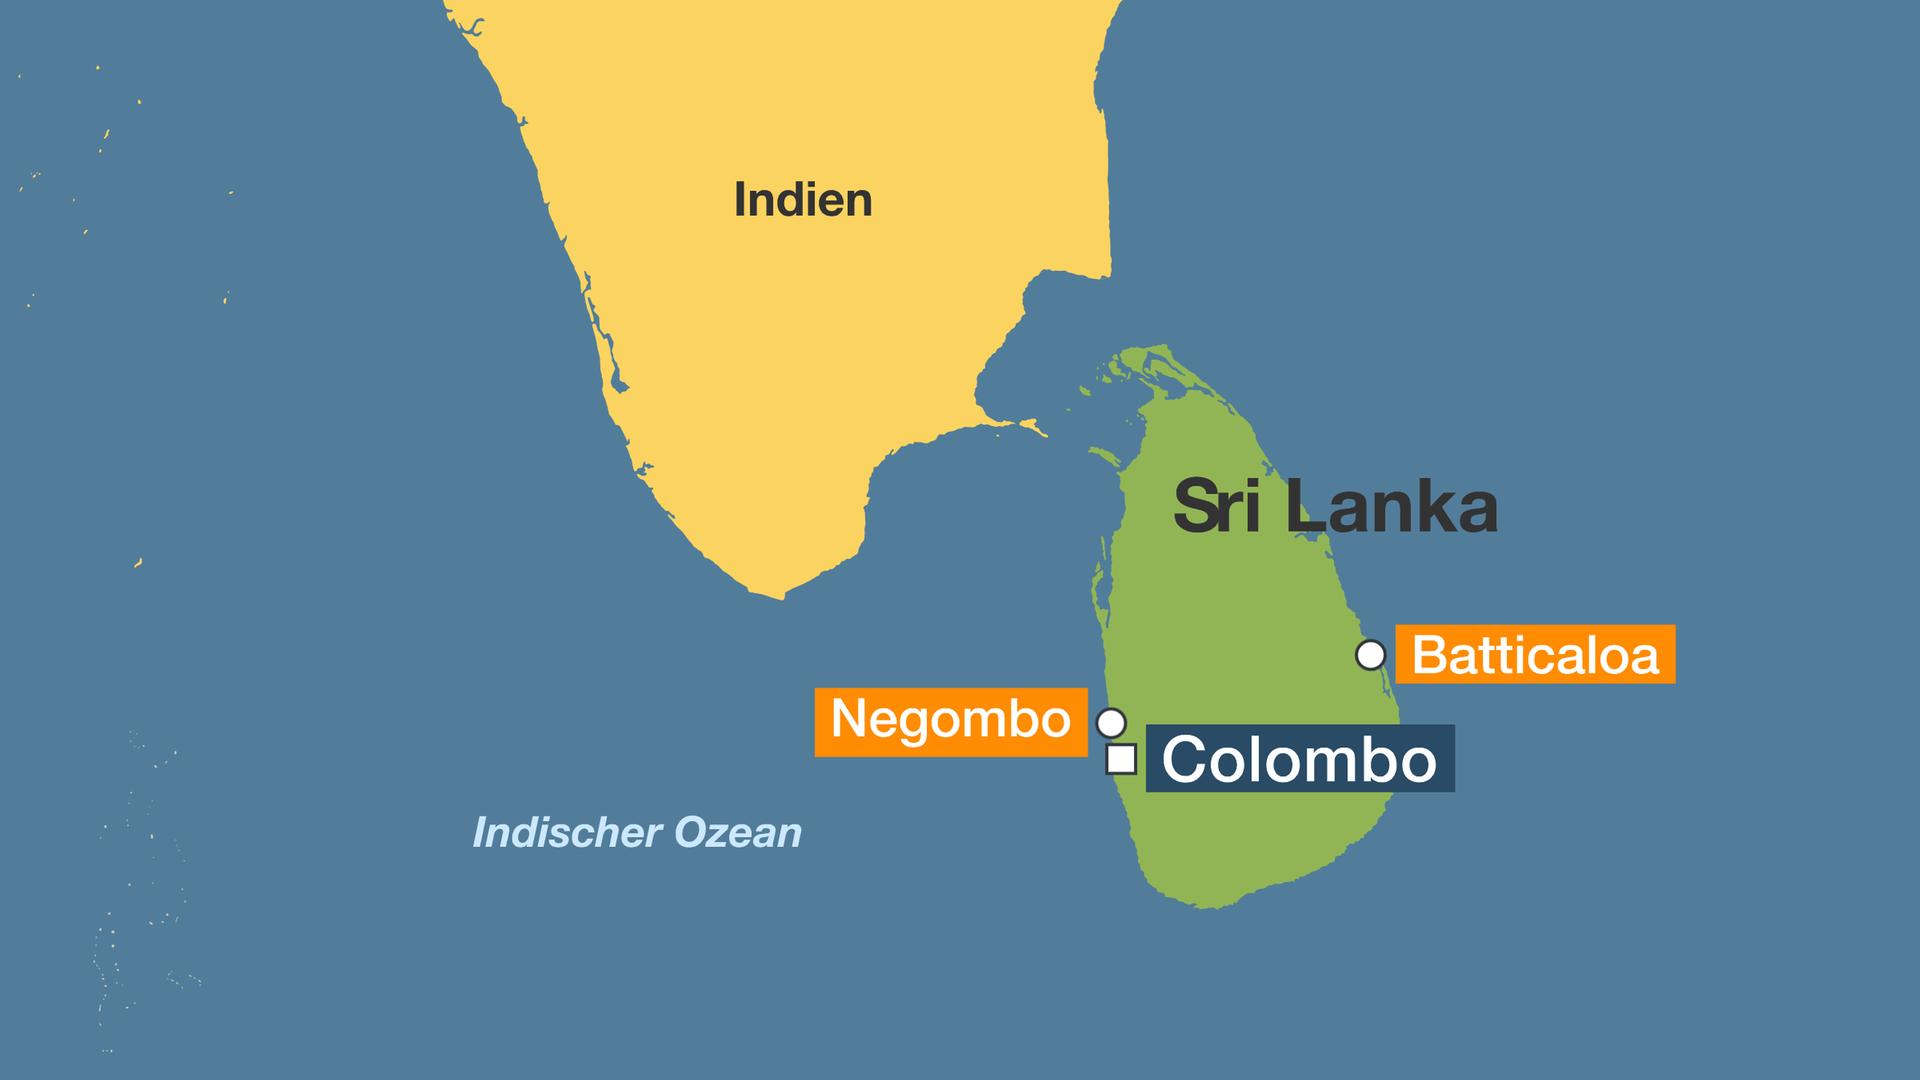 Sri Lanka Karte Zum Drucken.Hintergrund Sri Lanka Religios Gespaltenes Land Zdfmediathek